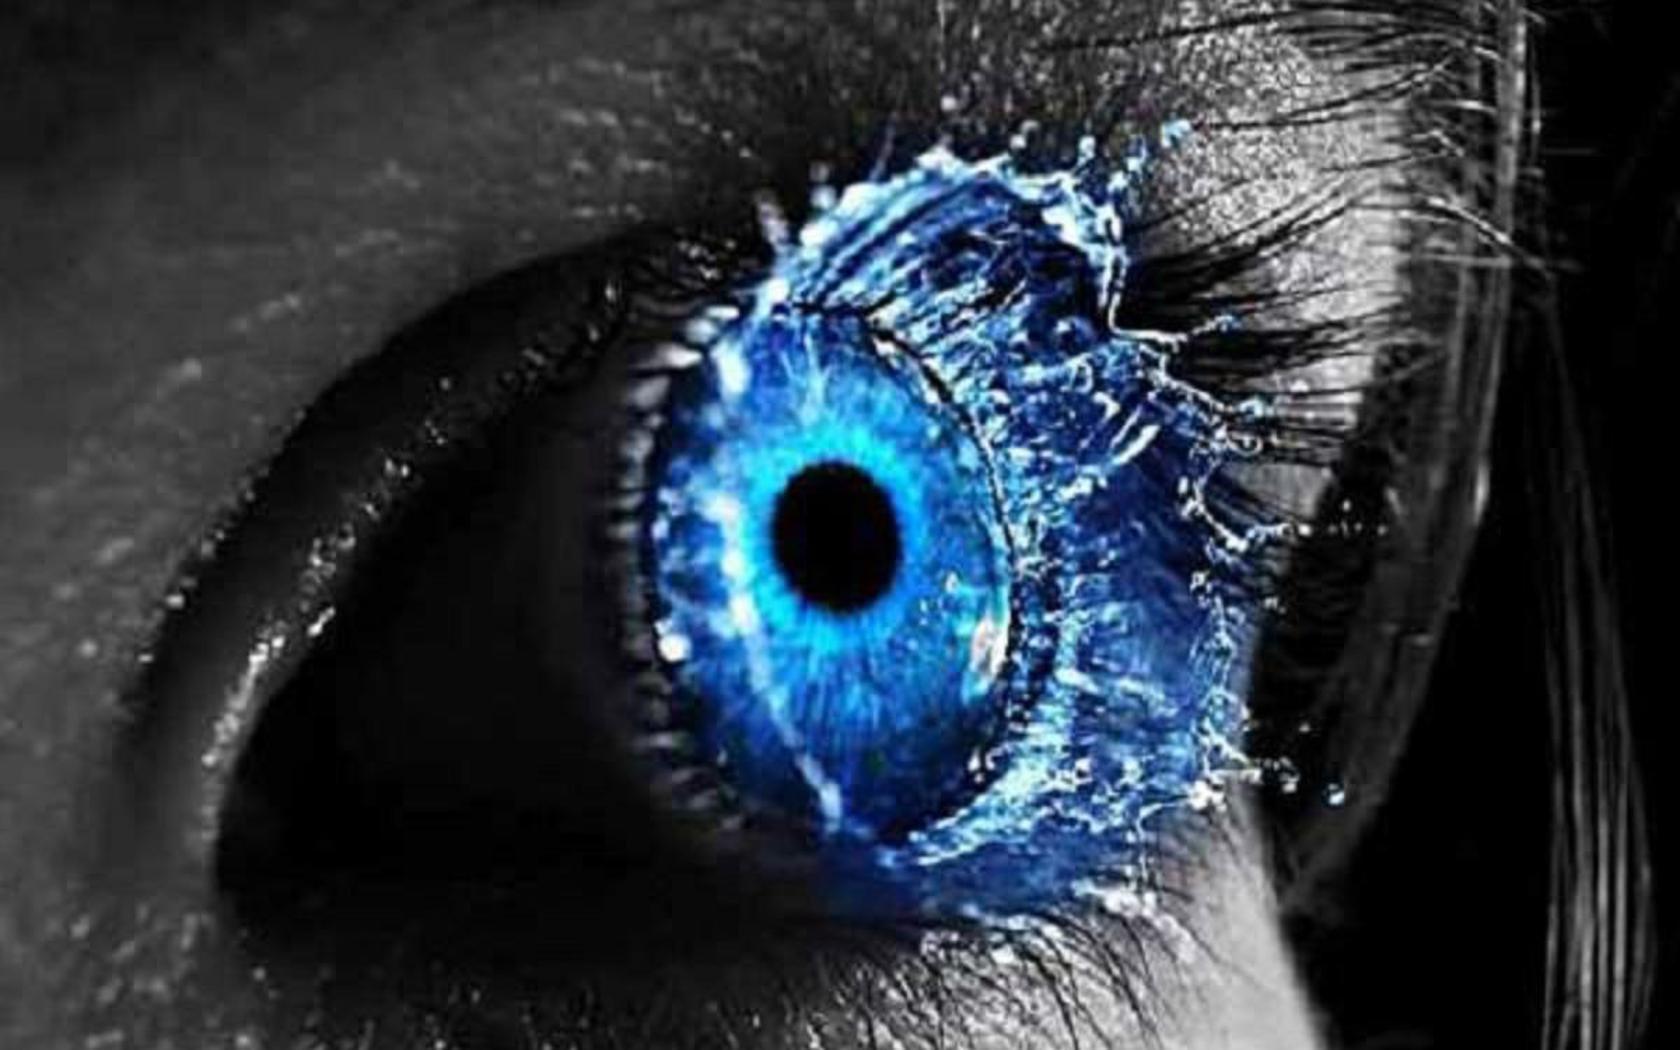 Best Evil Eye Wallpaper Id 496724 For High Resolution Hd 1680x1050